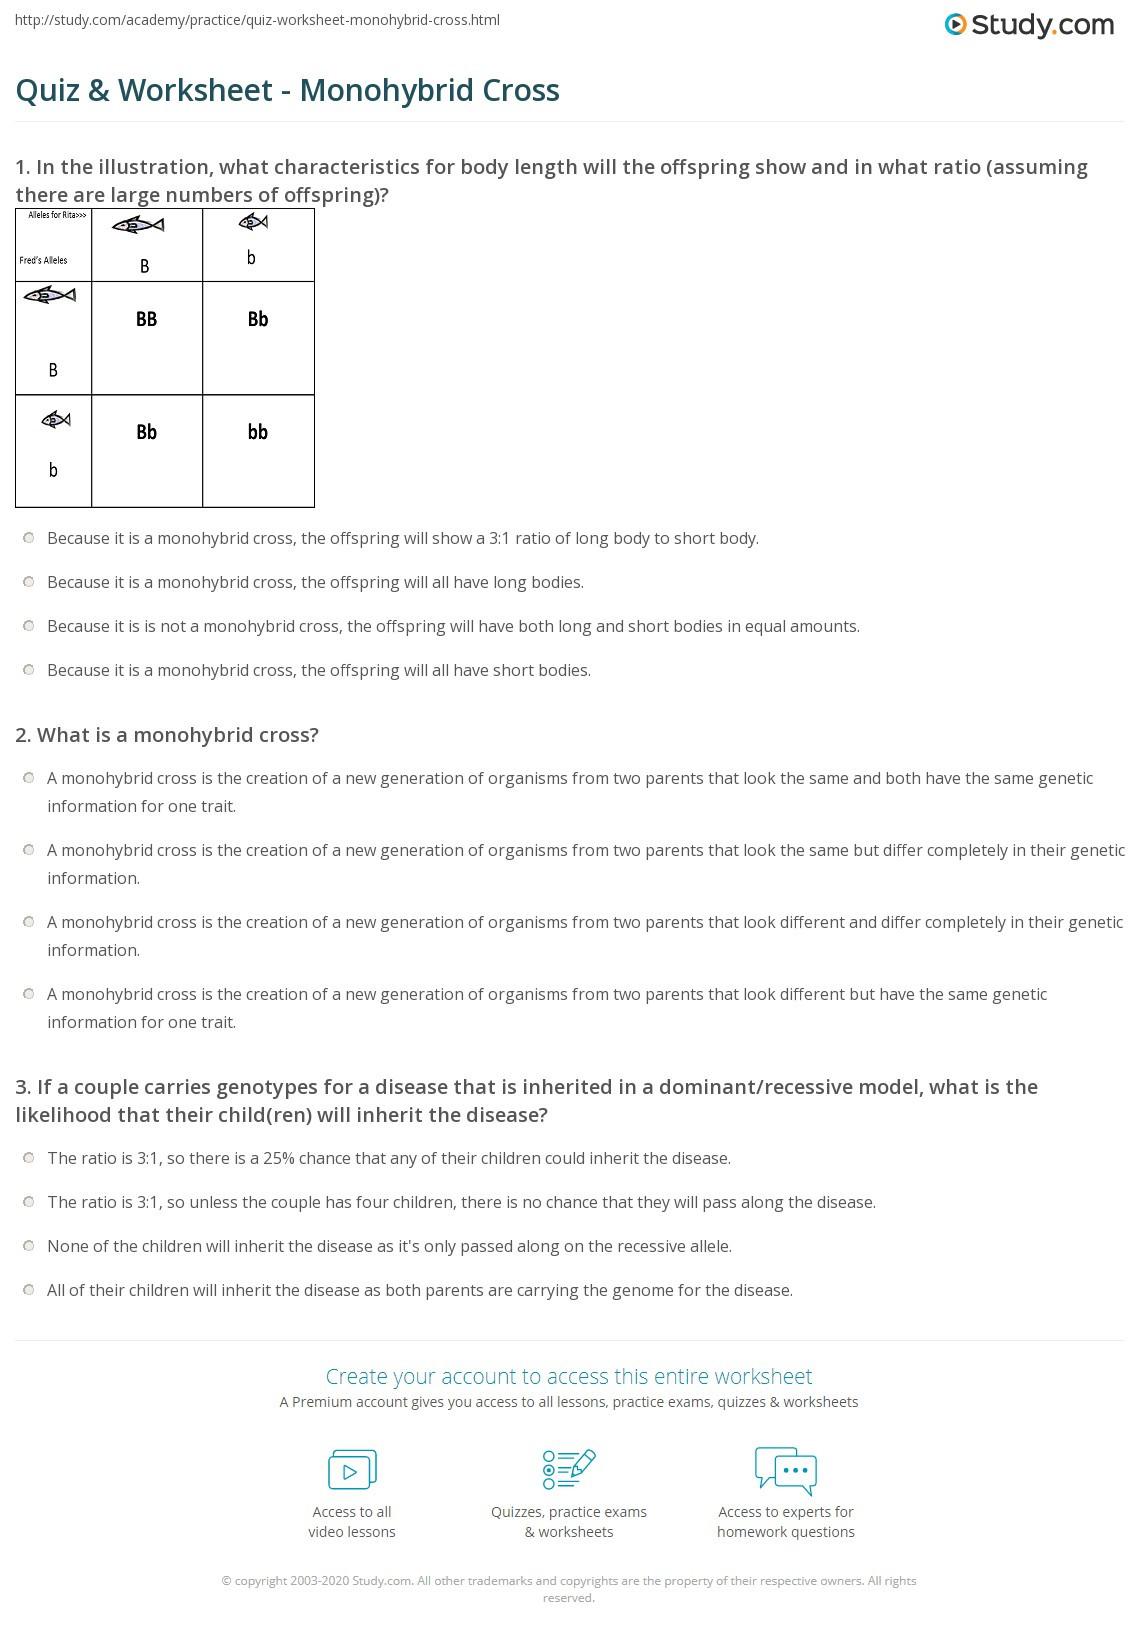 Monohybrid Crosses Worksheet Answers Quiz & Worksheet Monohybrid Cross